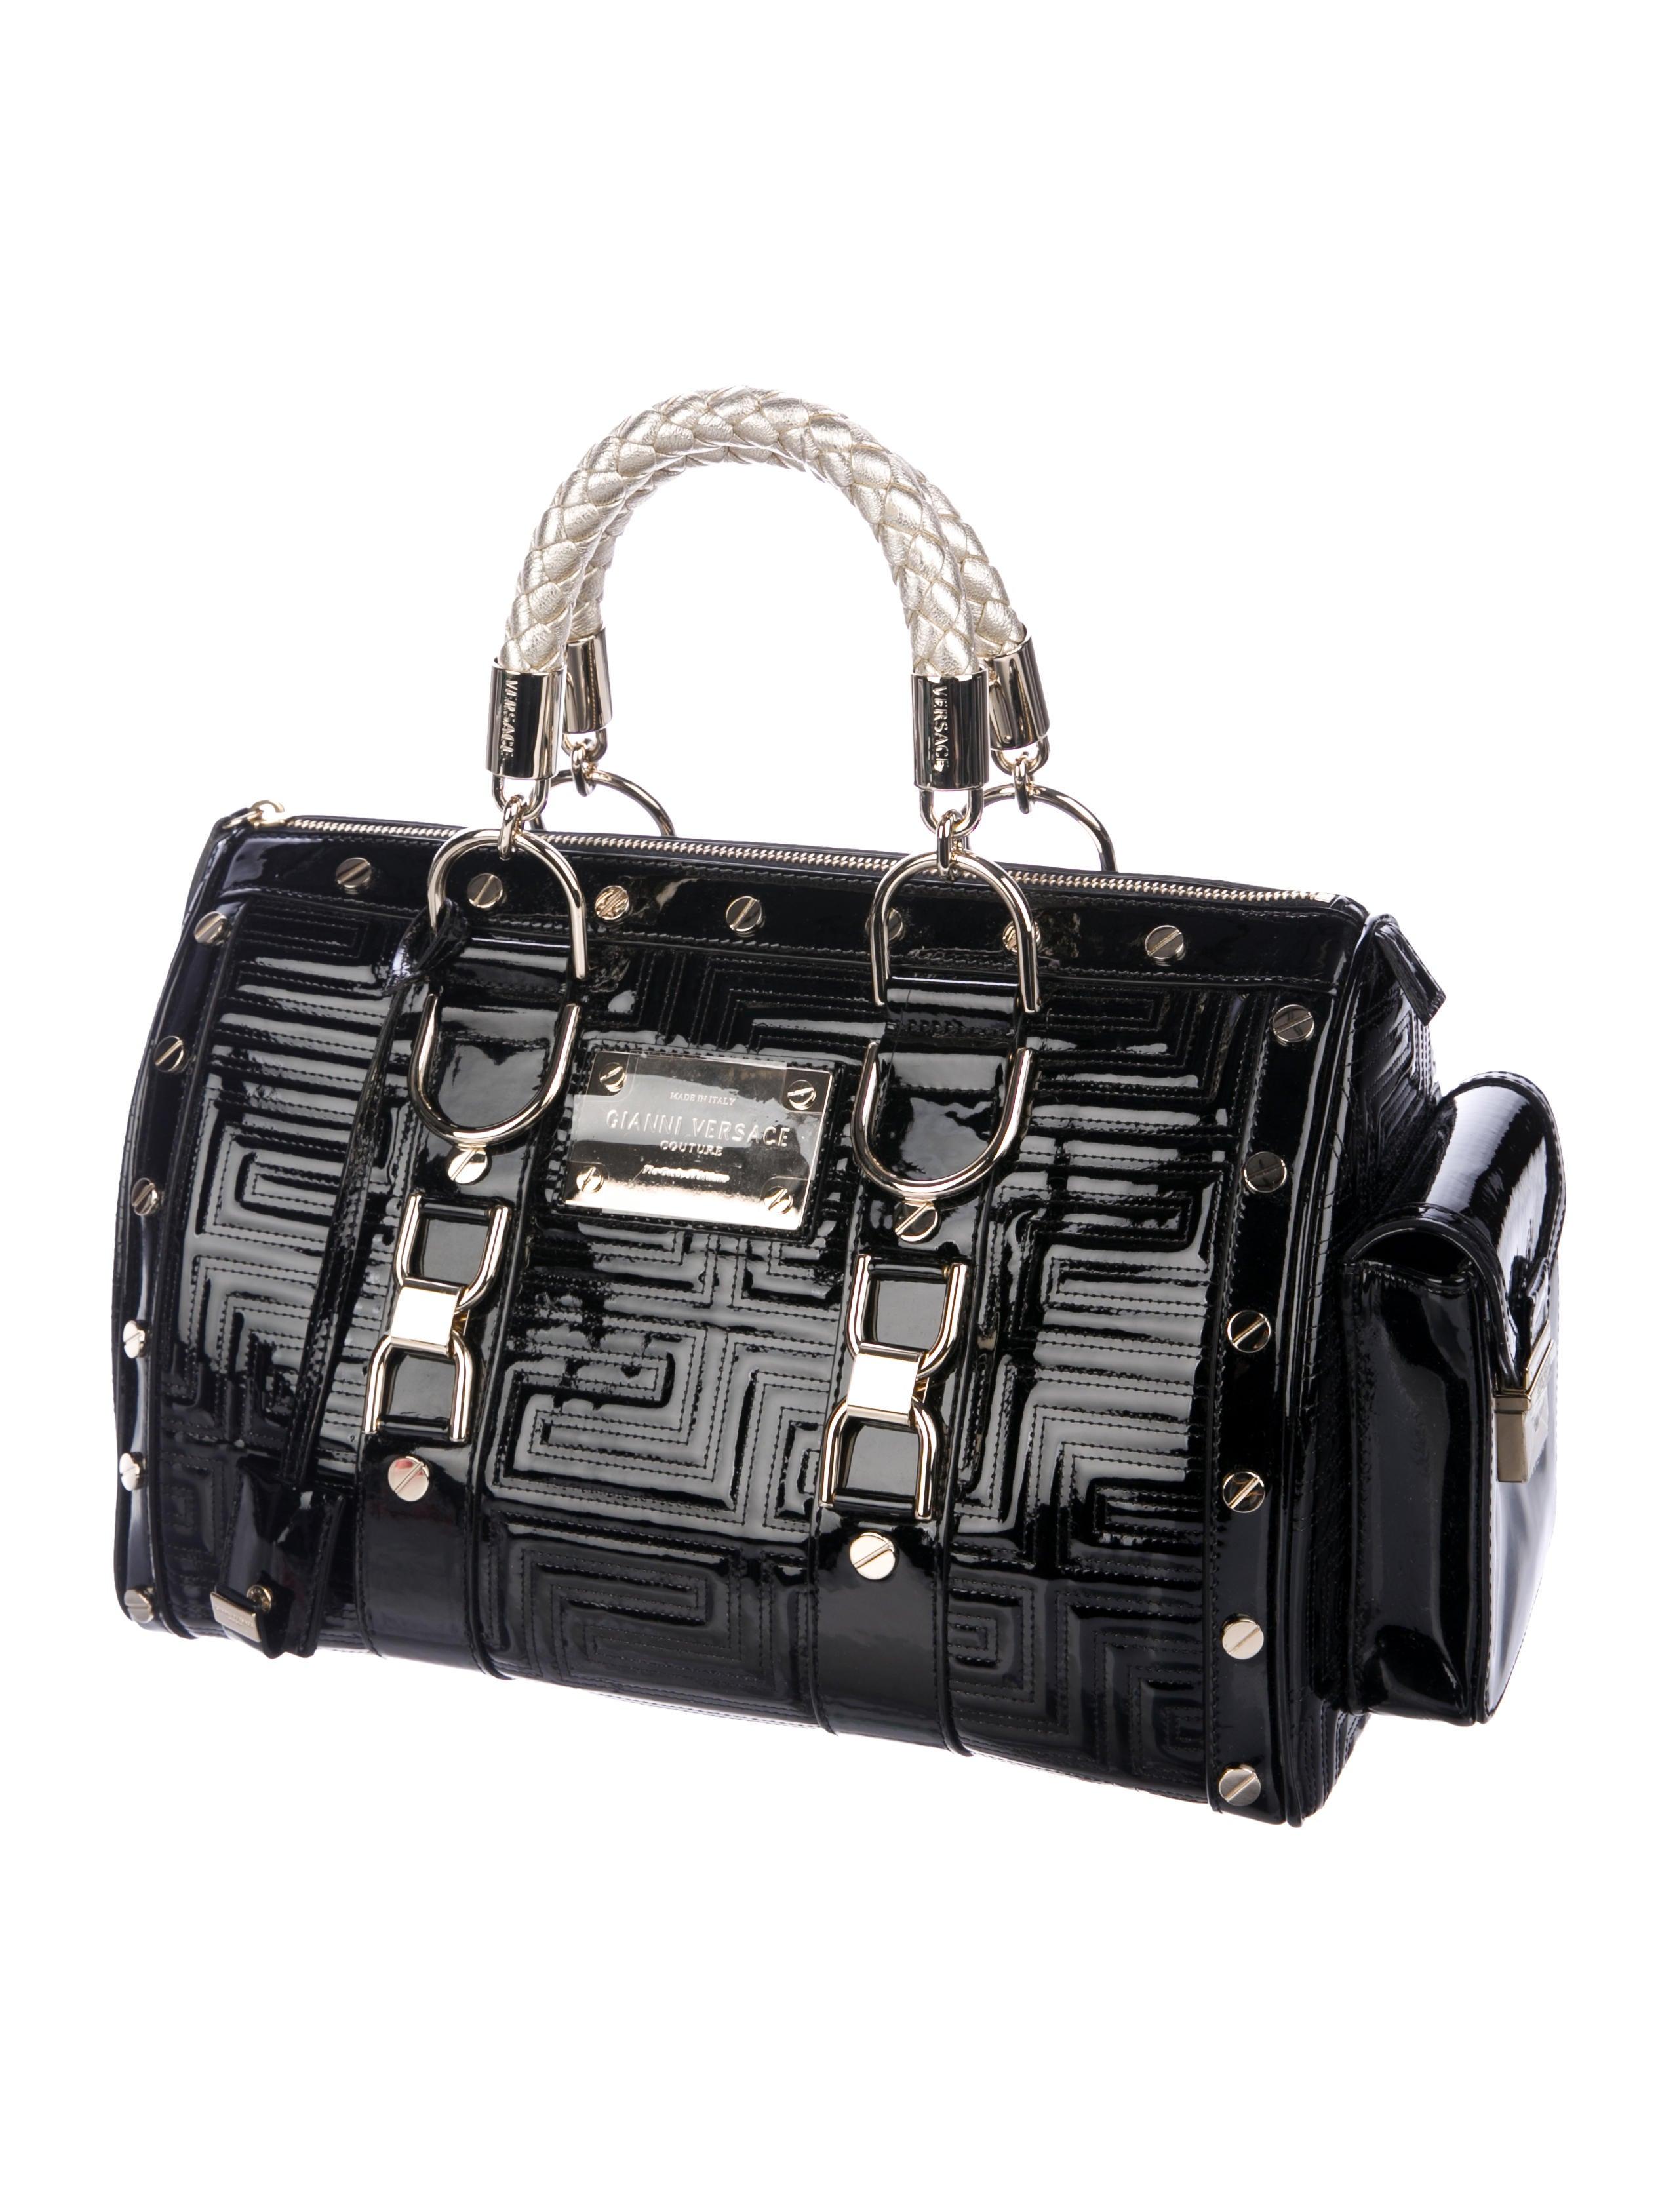 Gianni Versace Madonna Patent Leather Bag - Handbags - GVE21938 ... 07e8abeba4c70